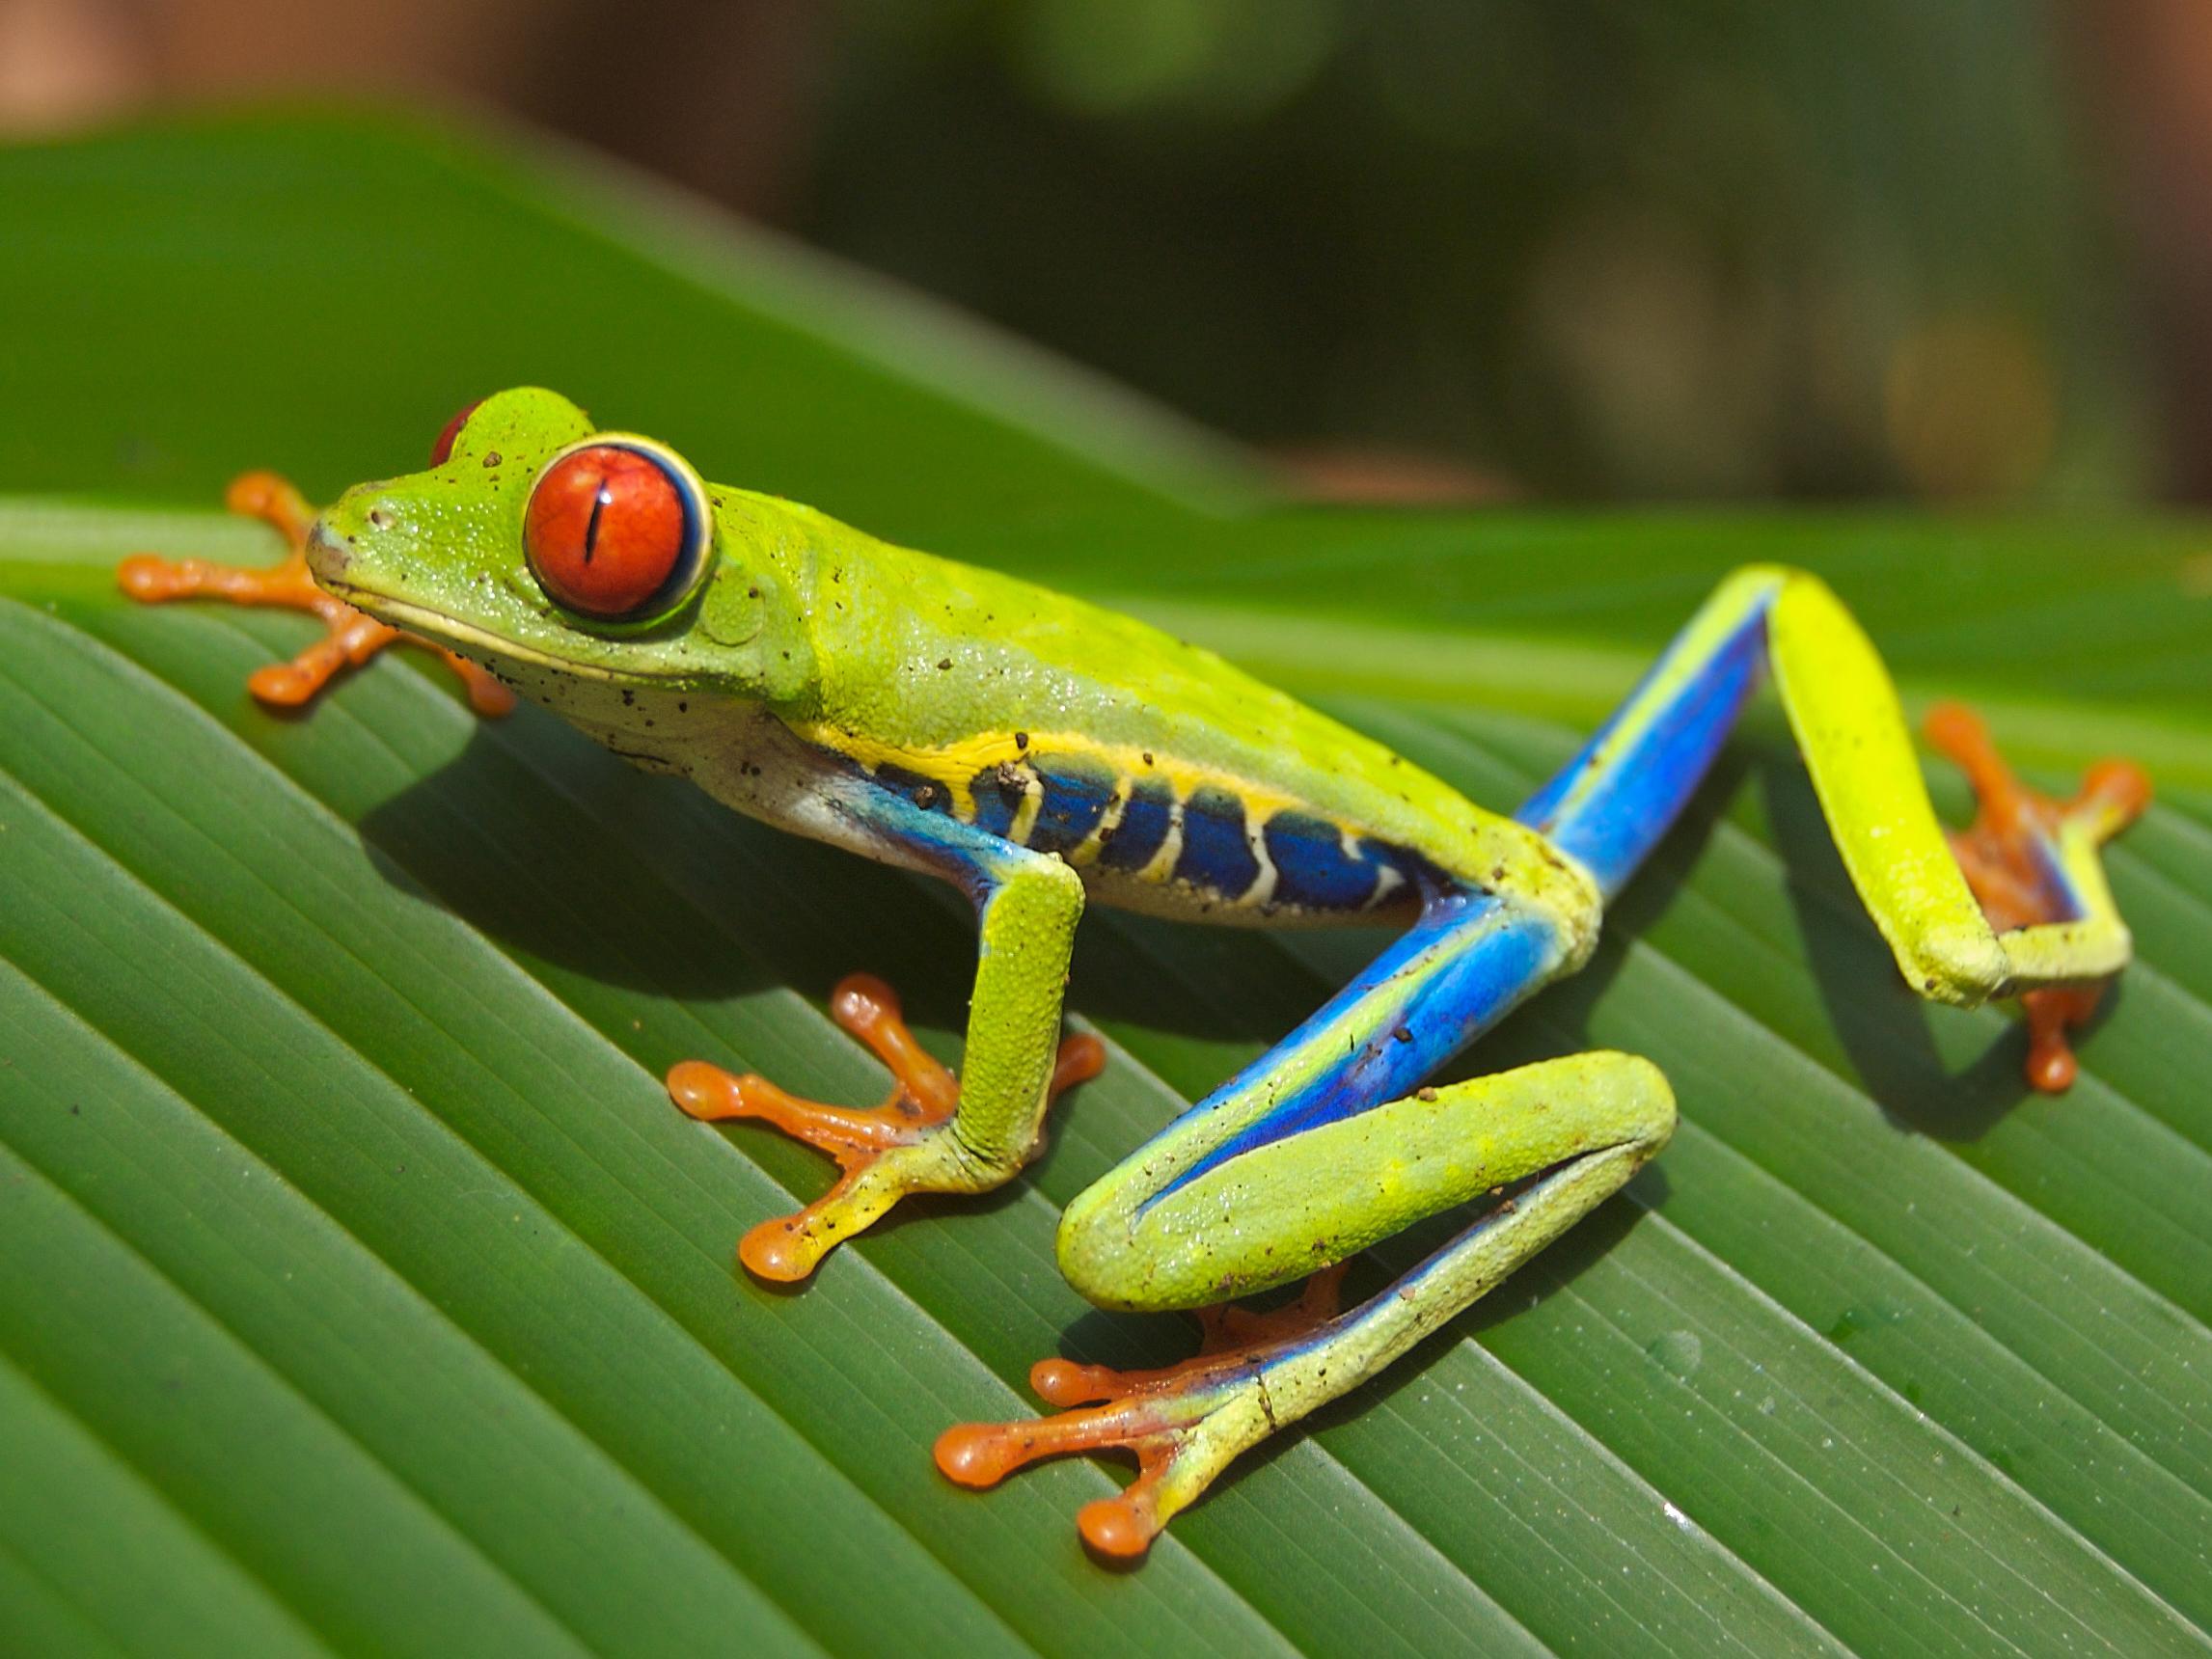 Costa Rica acogerá congreso sobre inteligencia turística sostenible